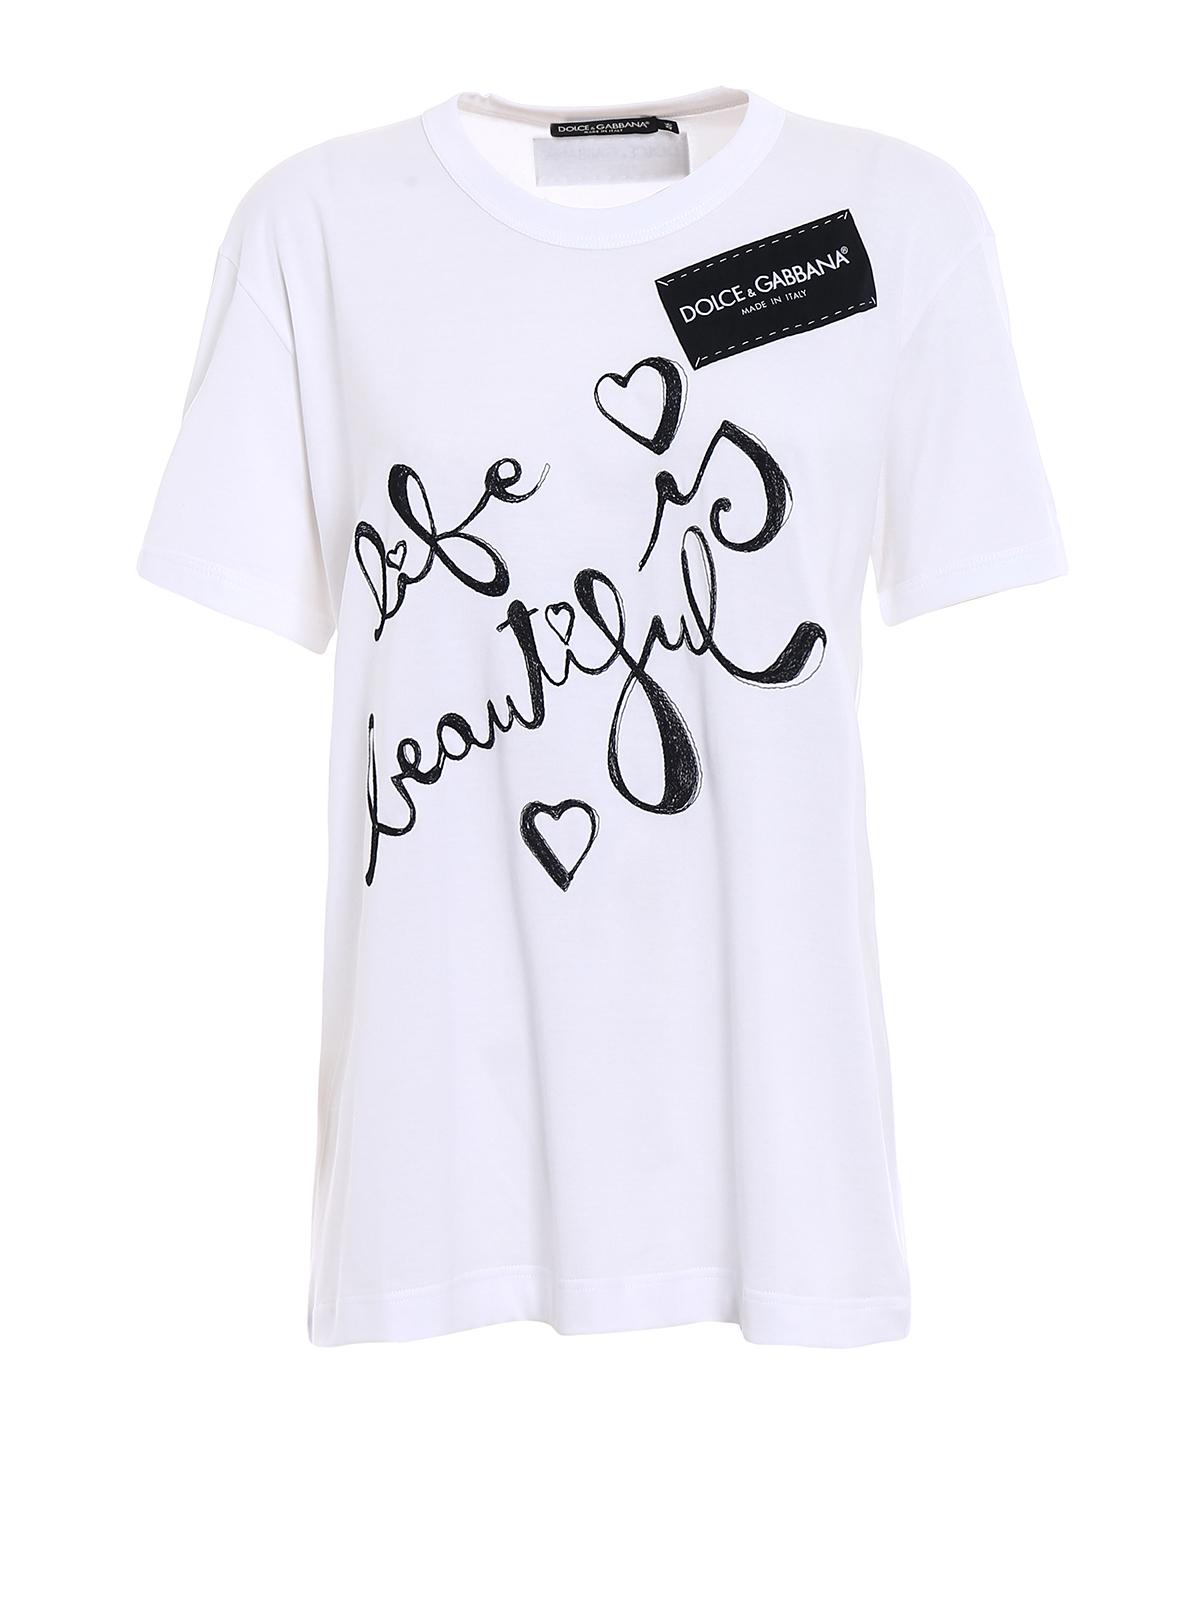 jersey logo detailed t shirt by dolce gabbana t shirts ikrix. Black Bedroom Furniture Sets. Home Design Ideas